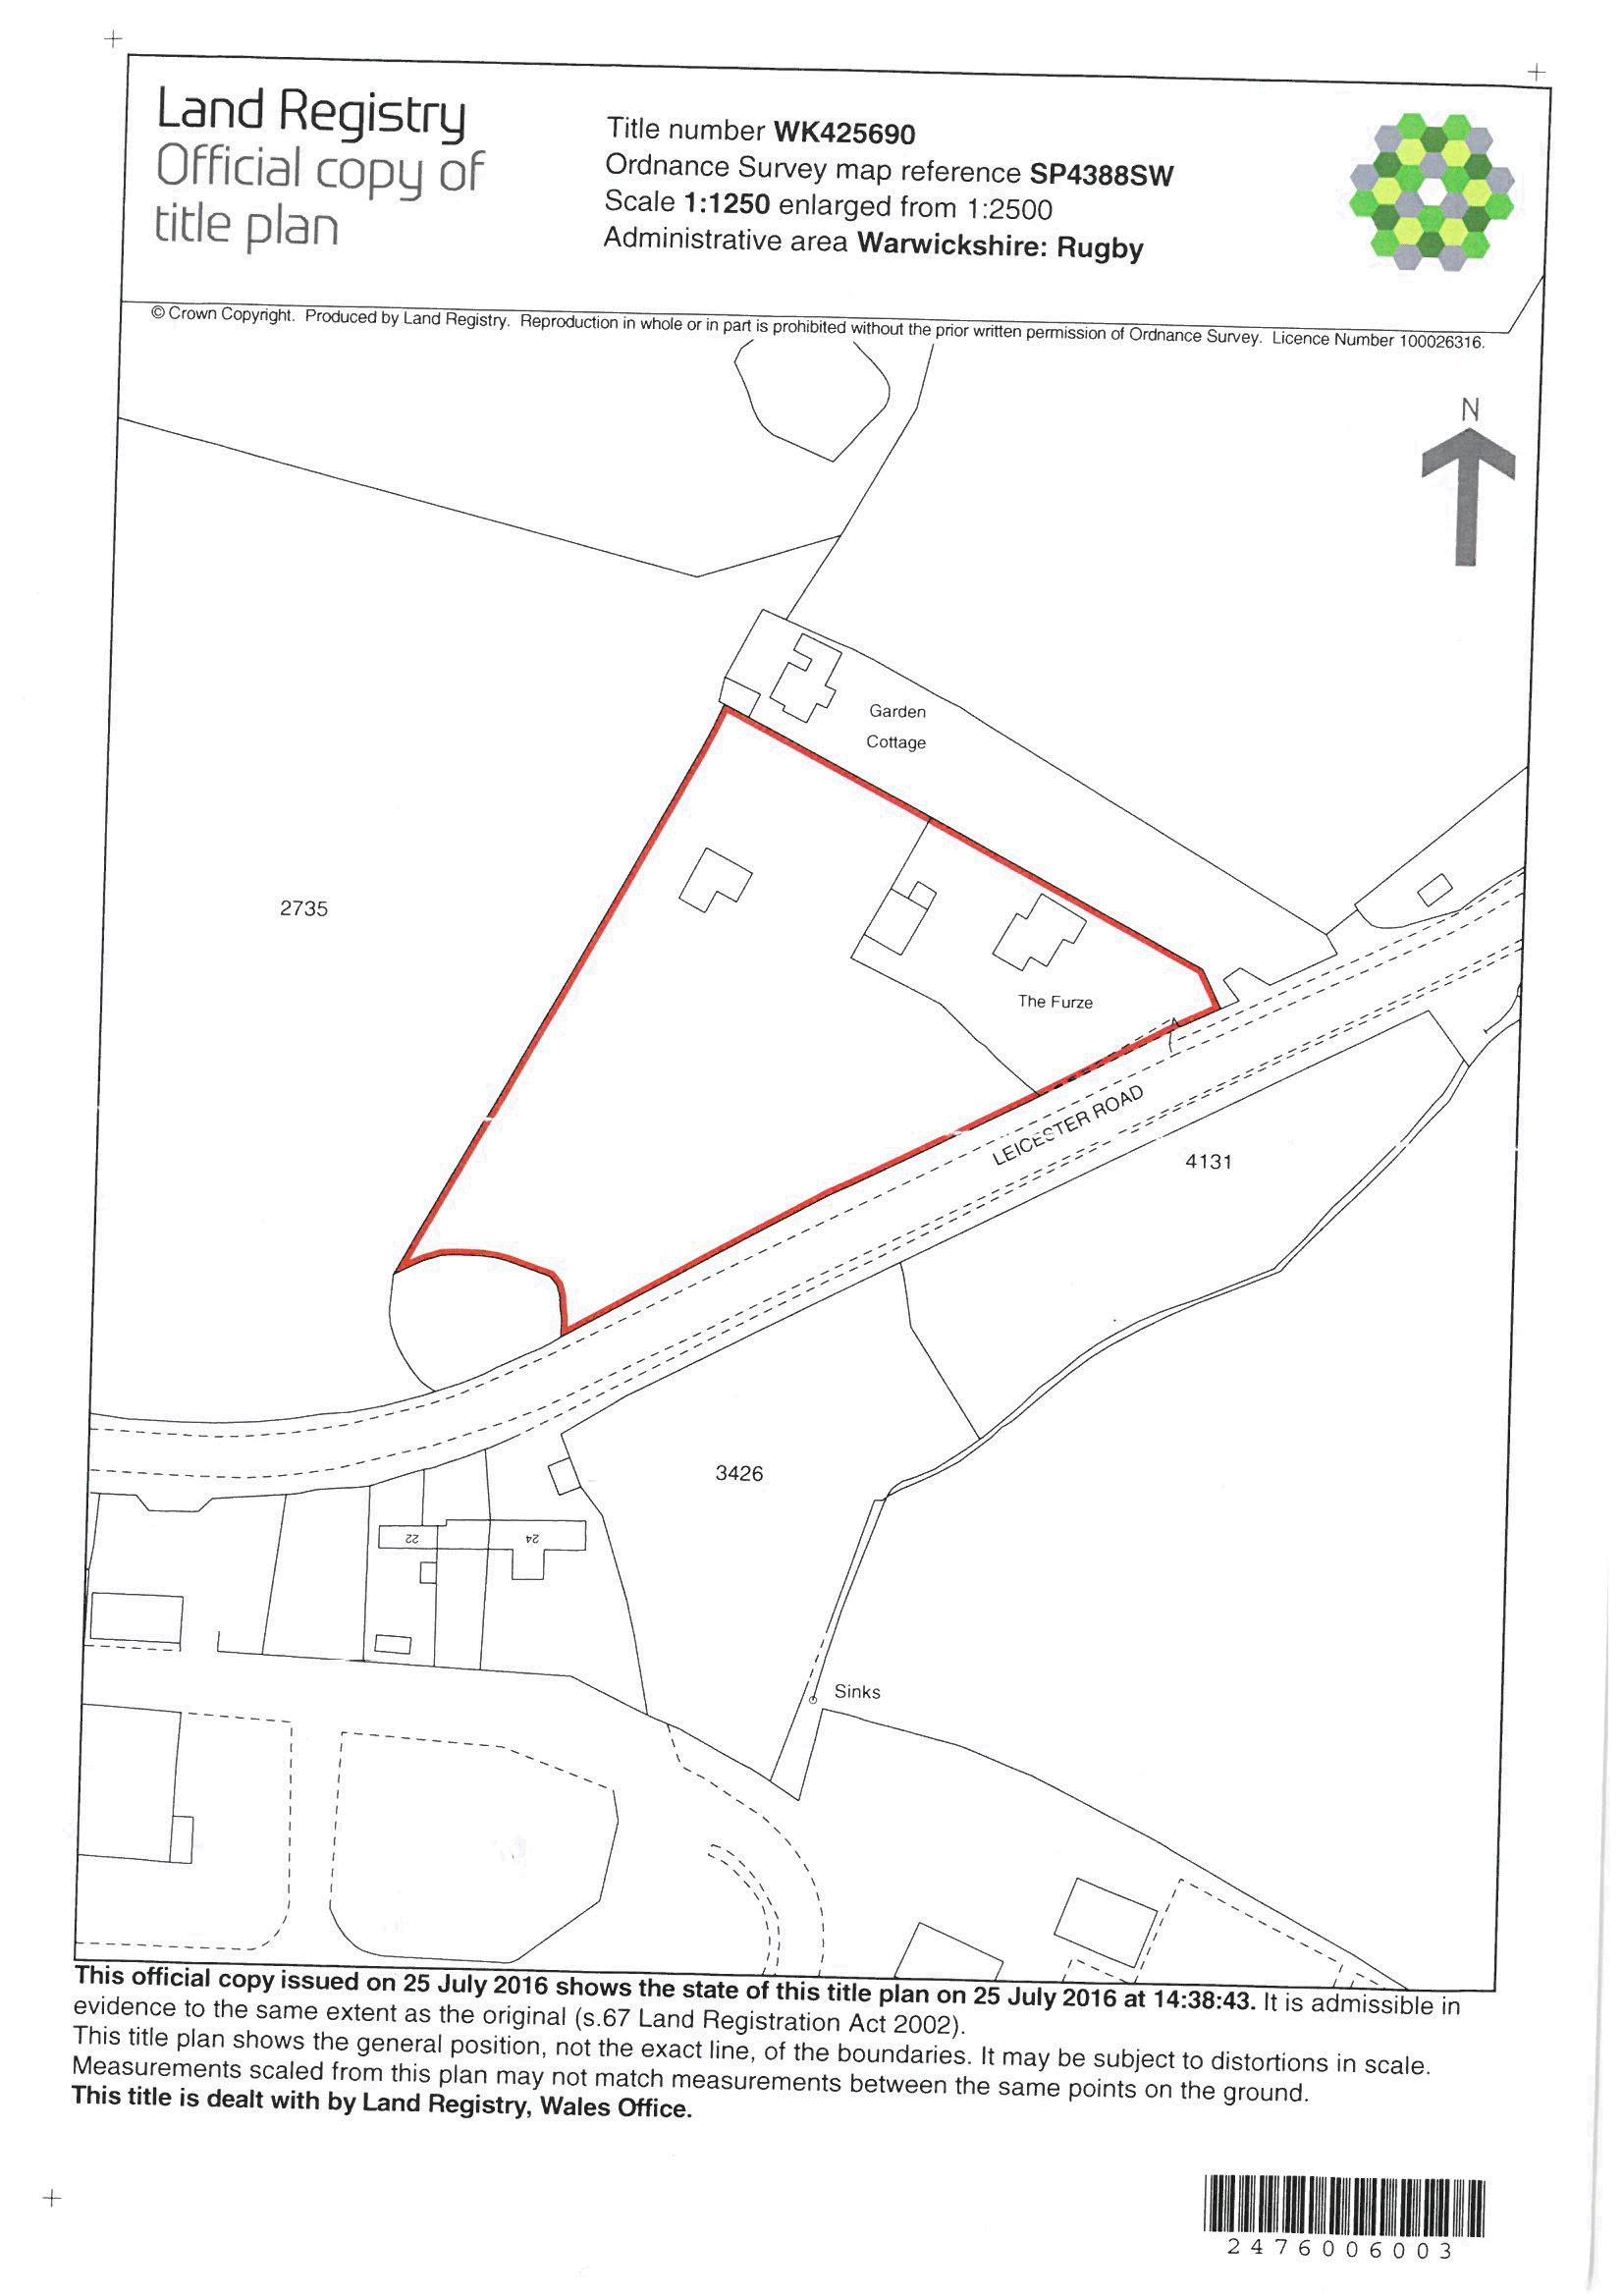 Land Registry Title Plan